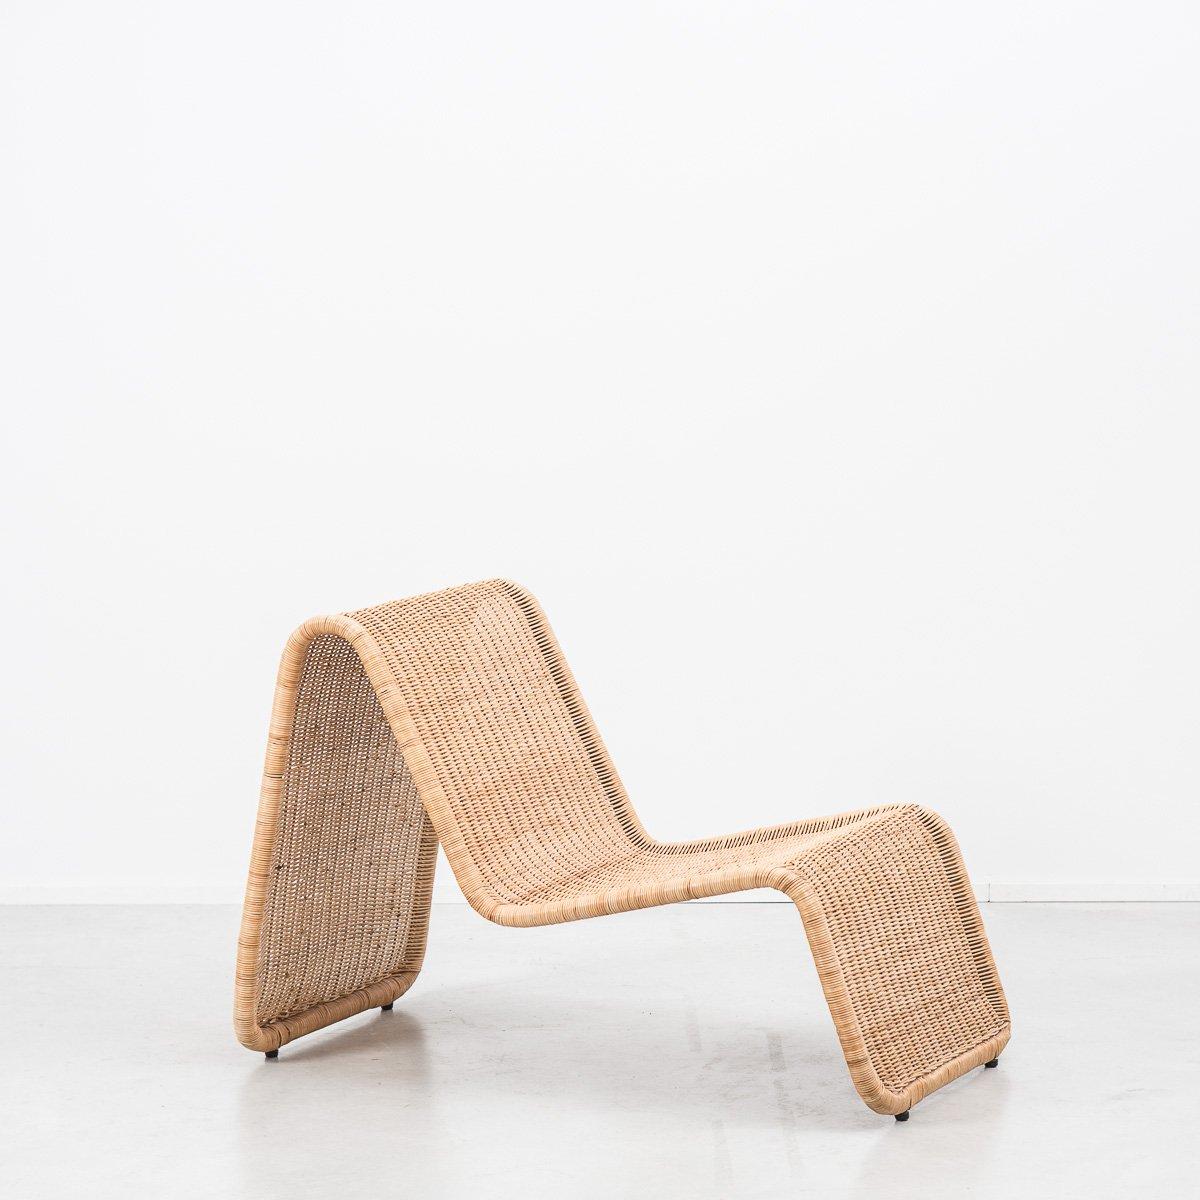 P3 Rattan Sessel von Tito Agnoli für Pierantonio Bonacina, 1960er | Wohnzimmer > Sessel > Rattansessel | Rattan | Pierantonio Bonacina